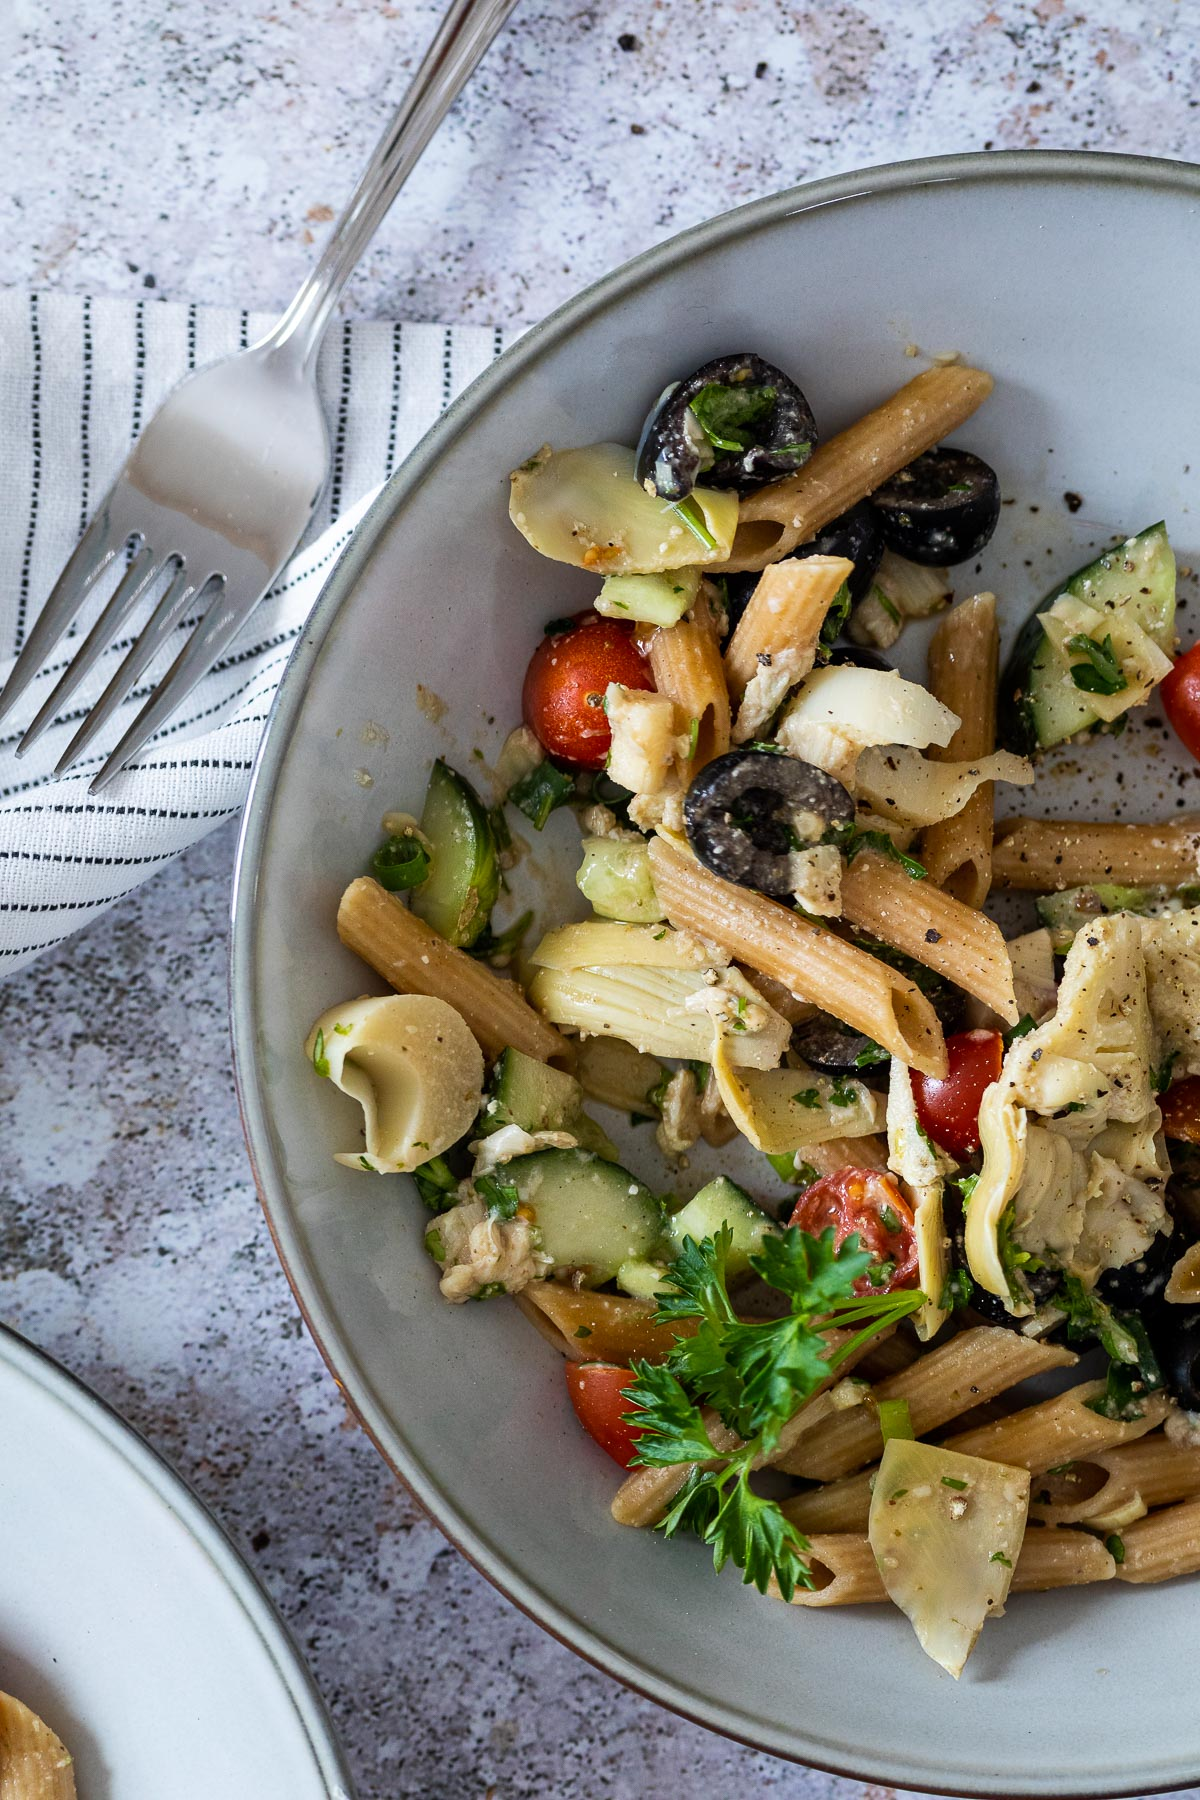 Bird View of vegan pasta salad with artichoke hearts